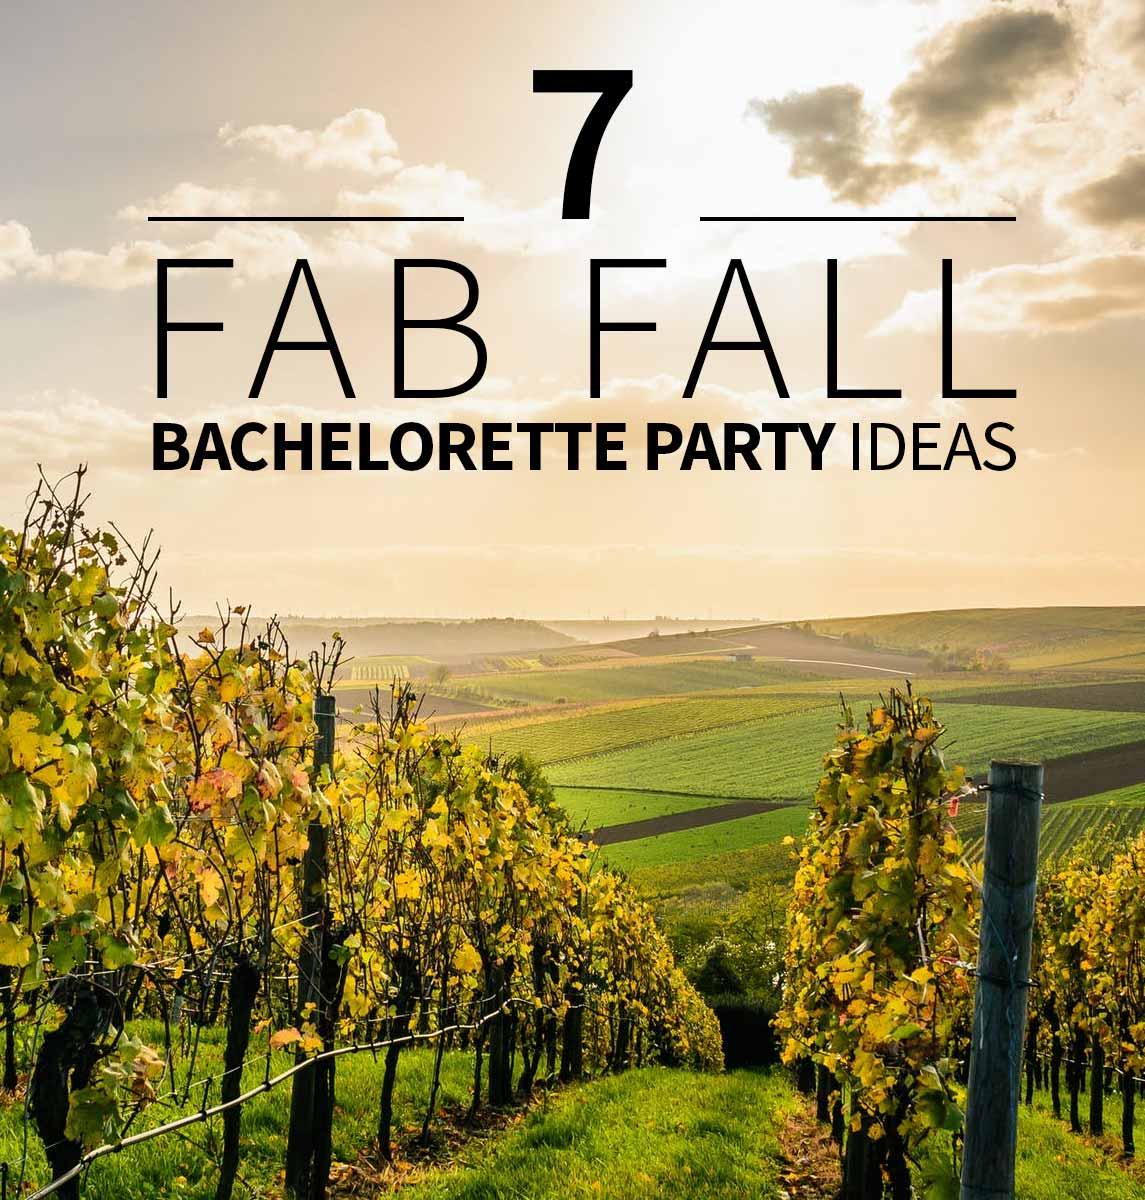 7 Ideas For A Fabulous Fall Bachelorette Party